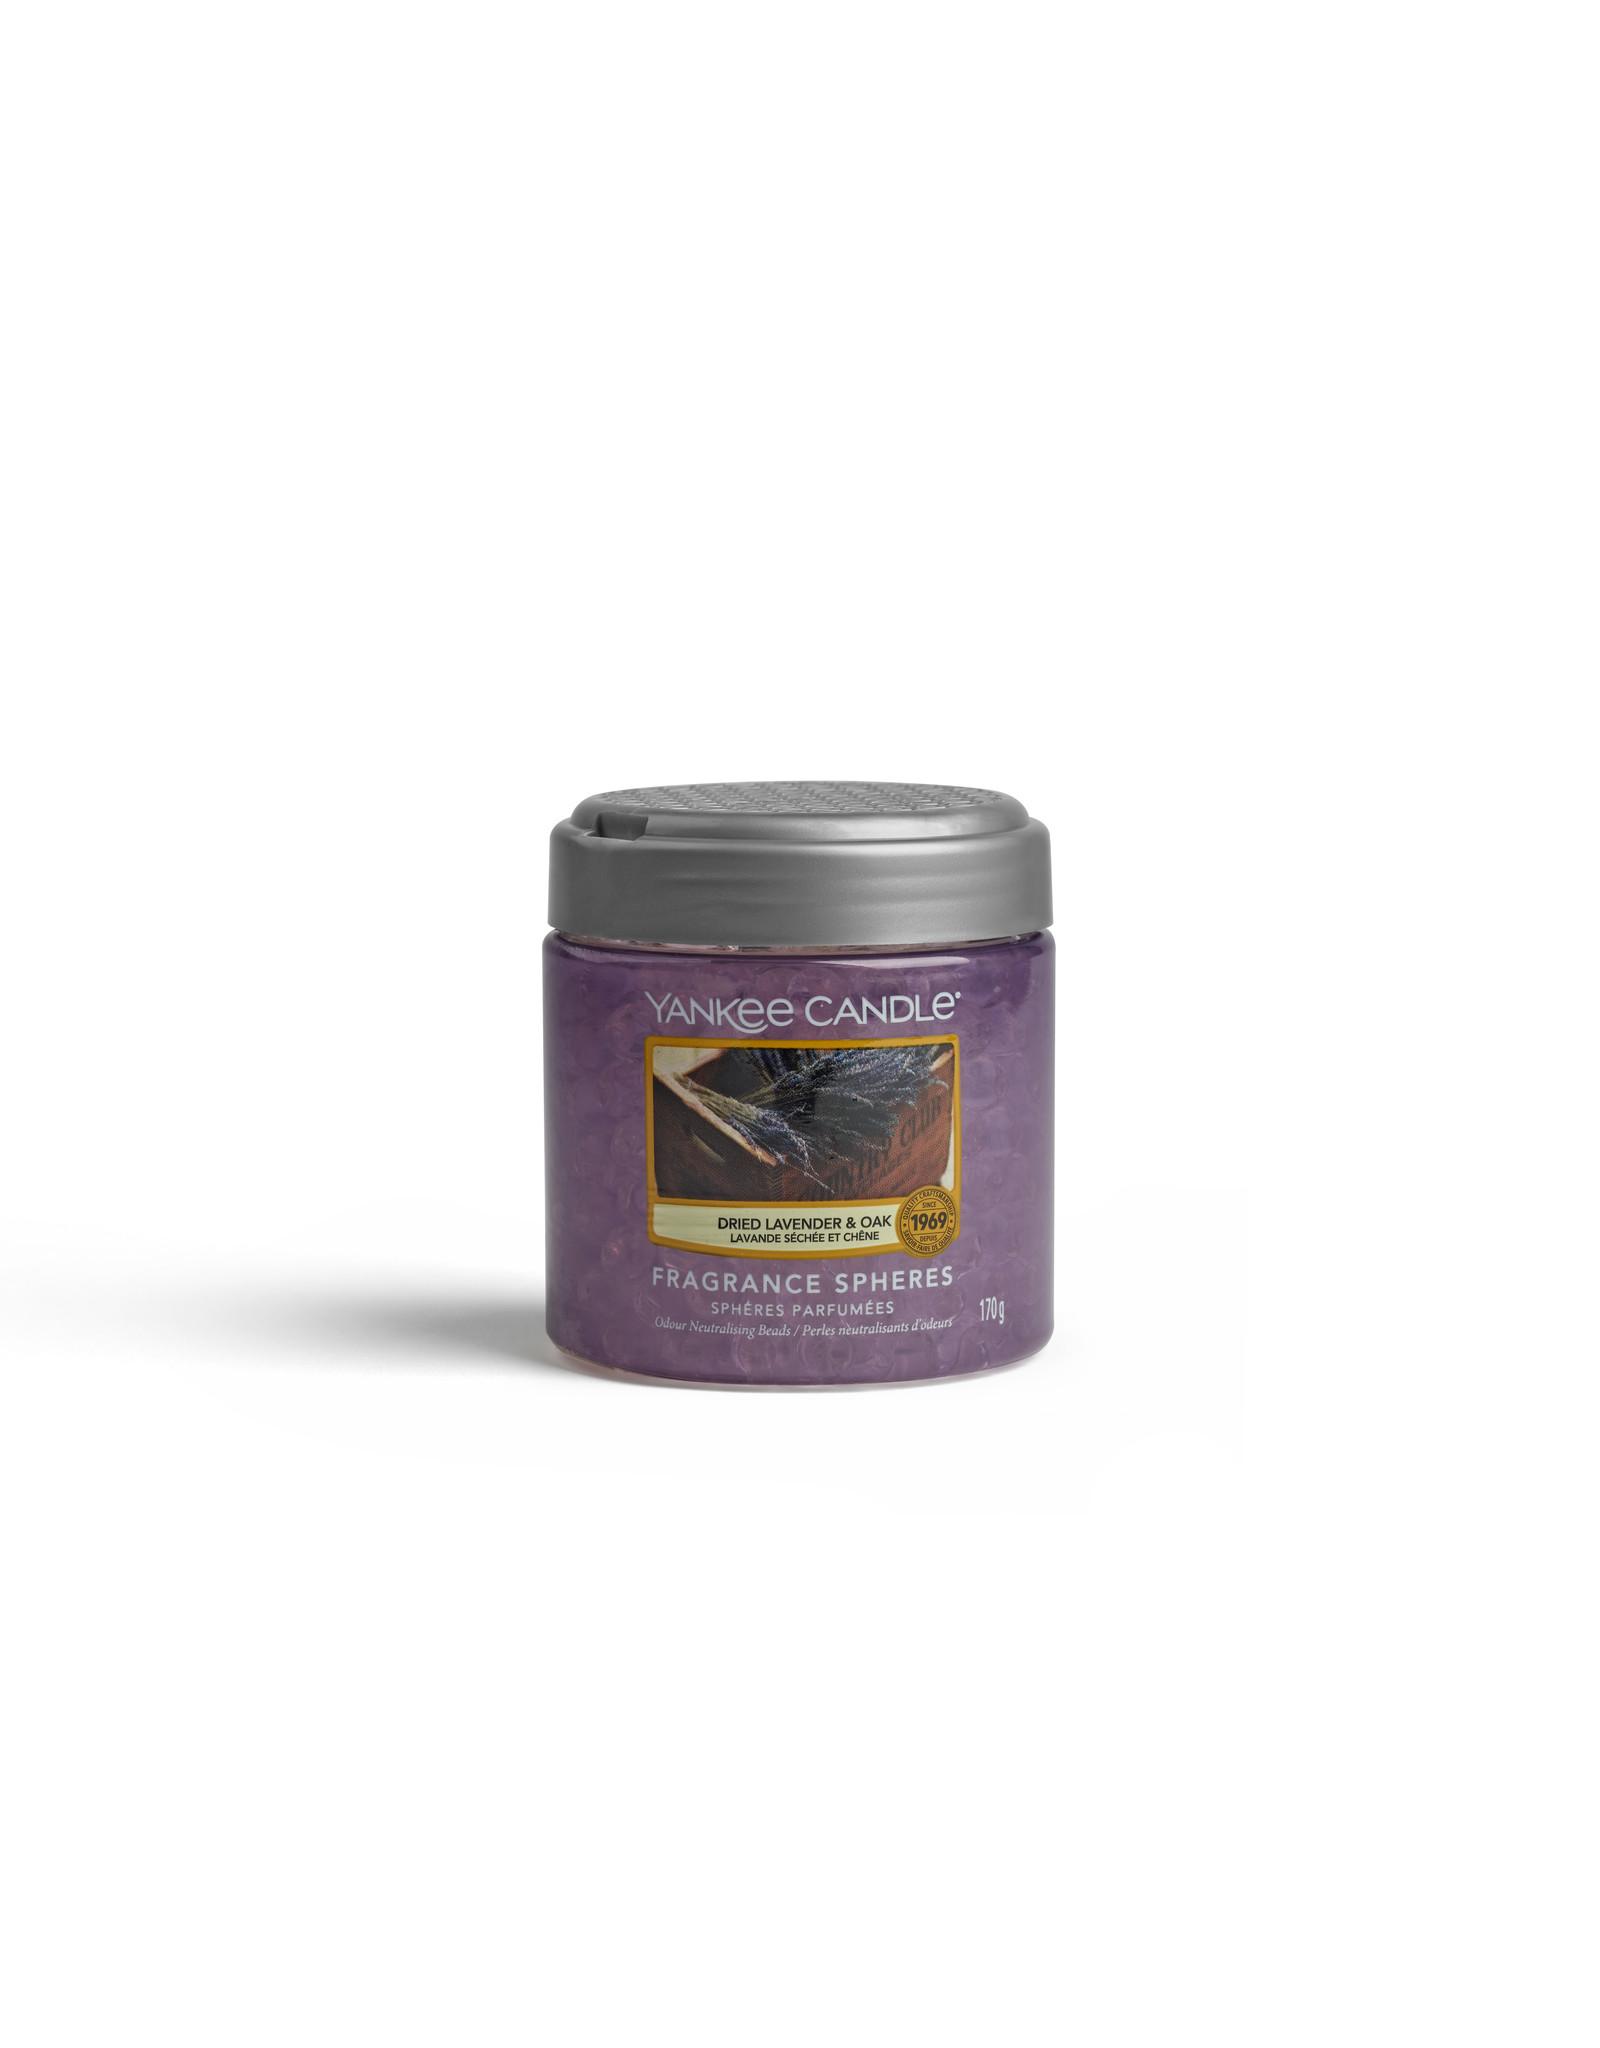 Yankee Candle Dried Lavender & Oak Fragrance Spheres